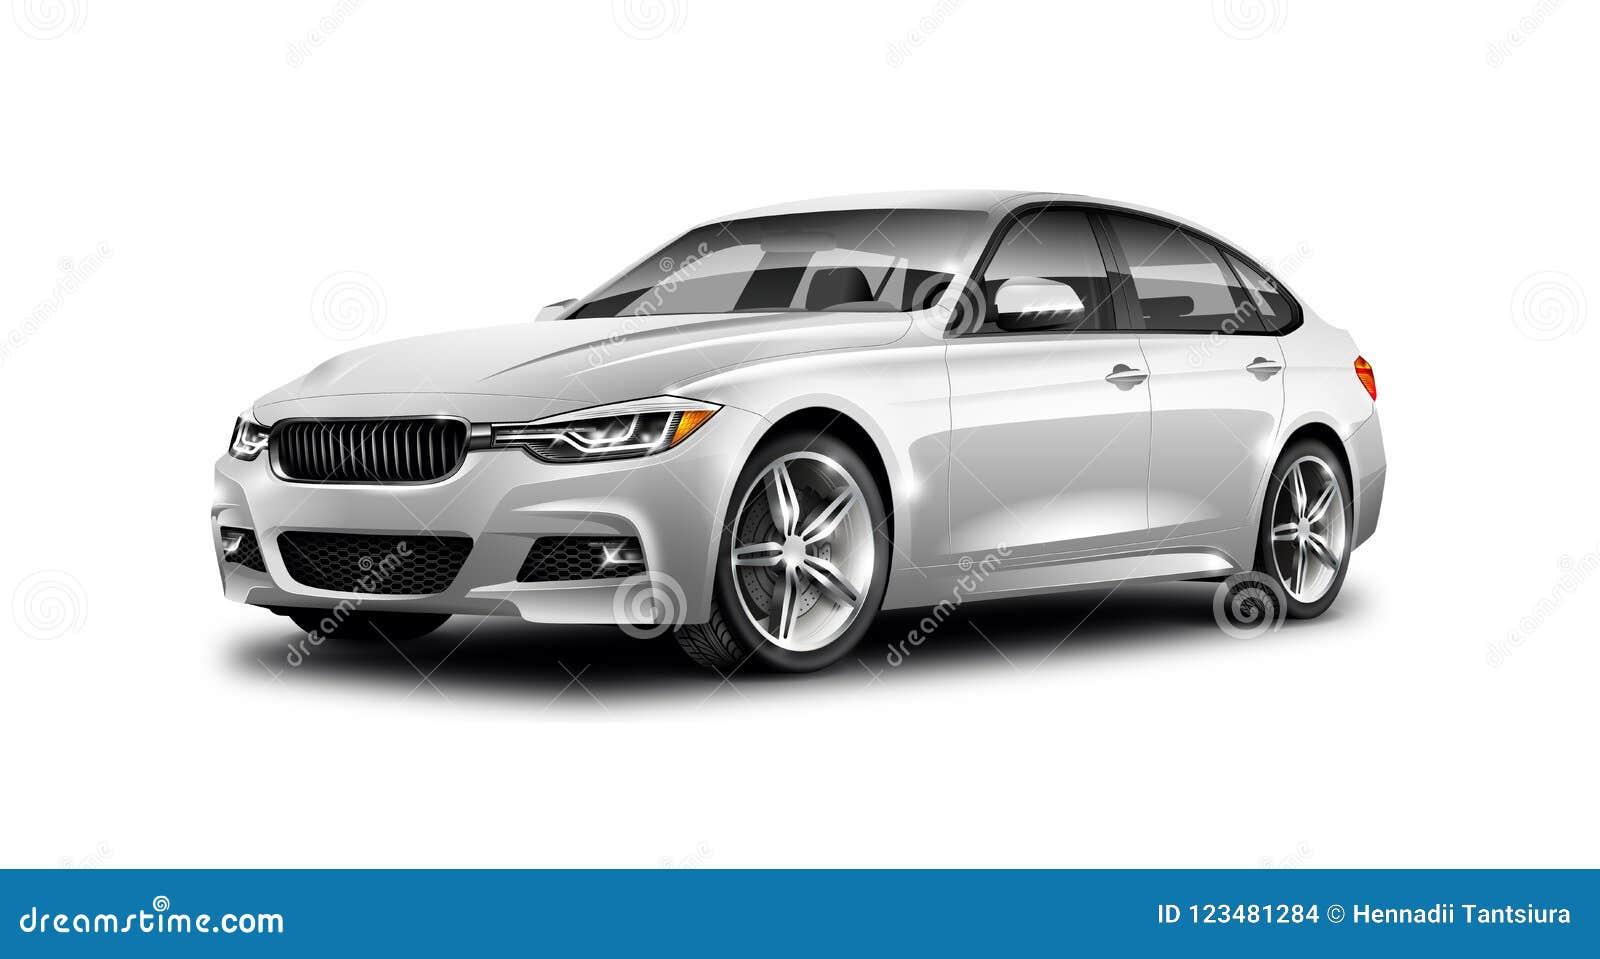 White Metallic Generic Sedan Car On White Background With Isolated Path.